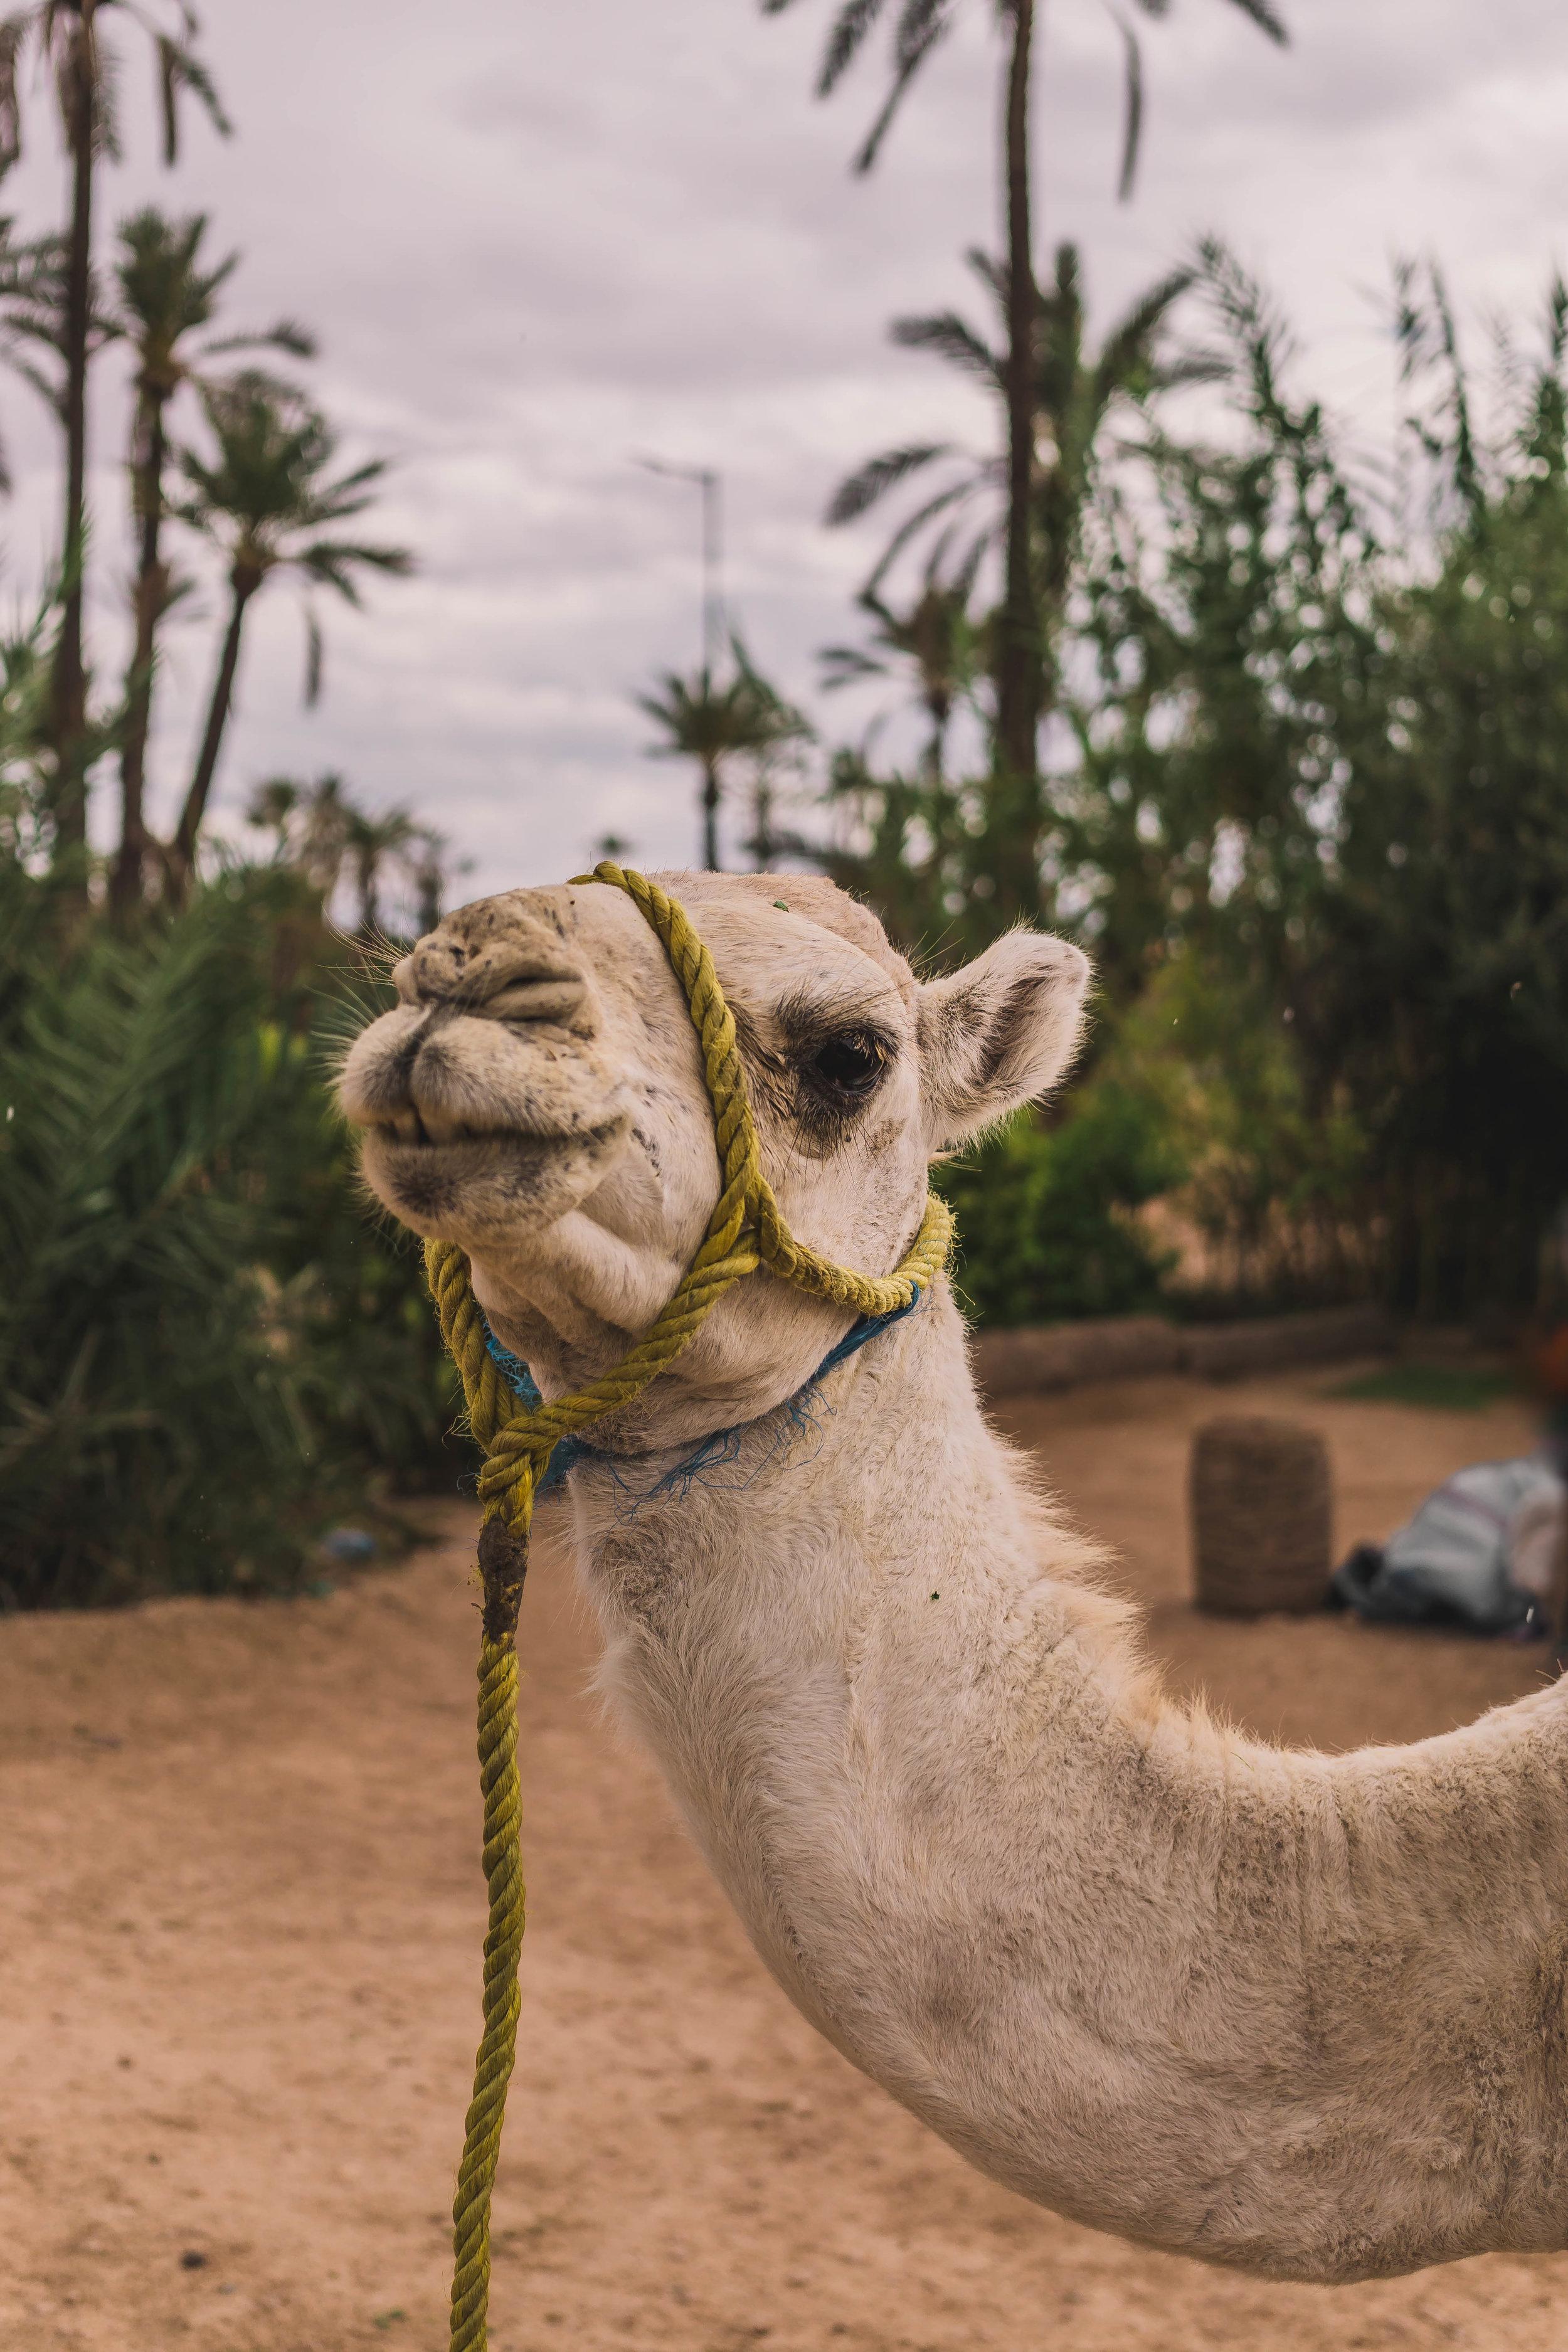 Young camel, Marrakech